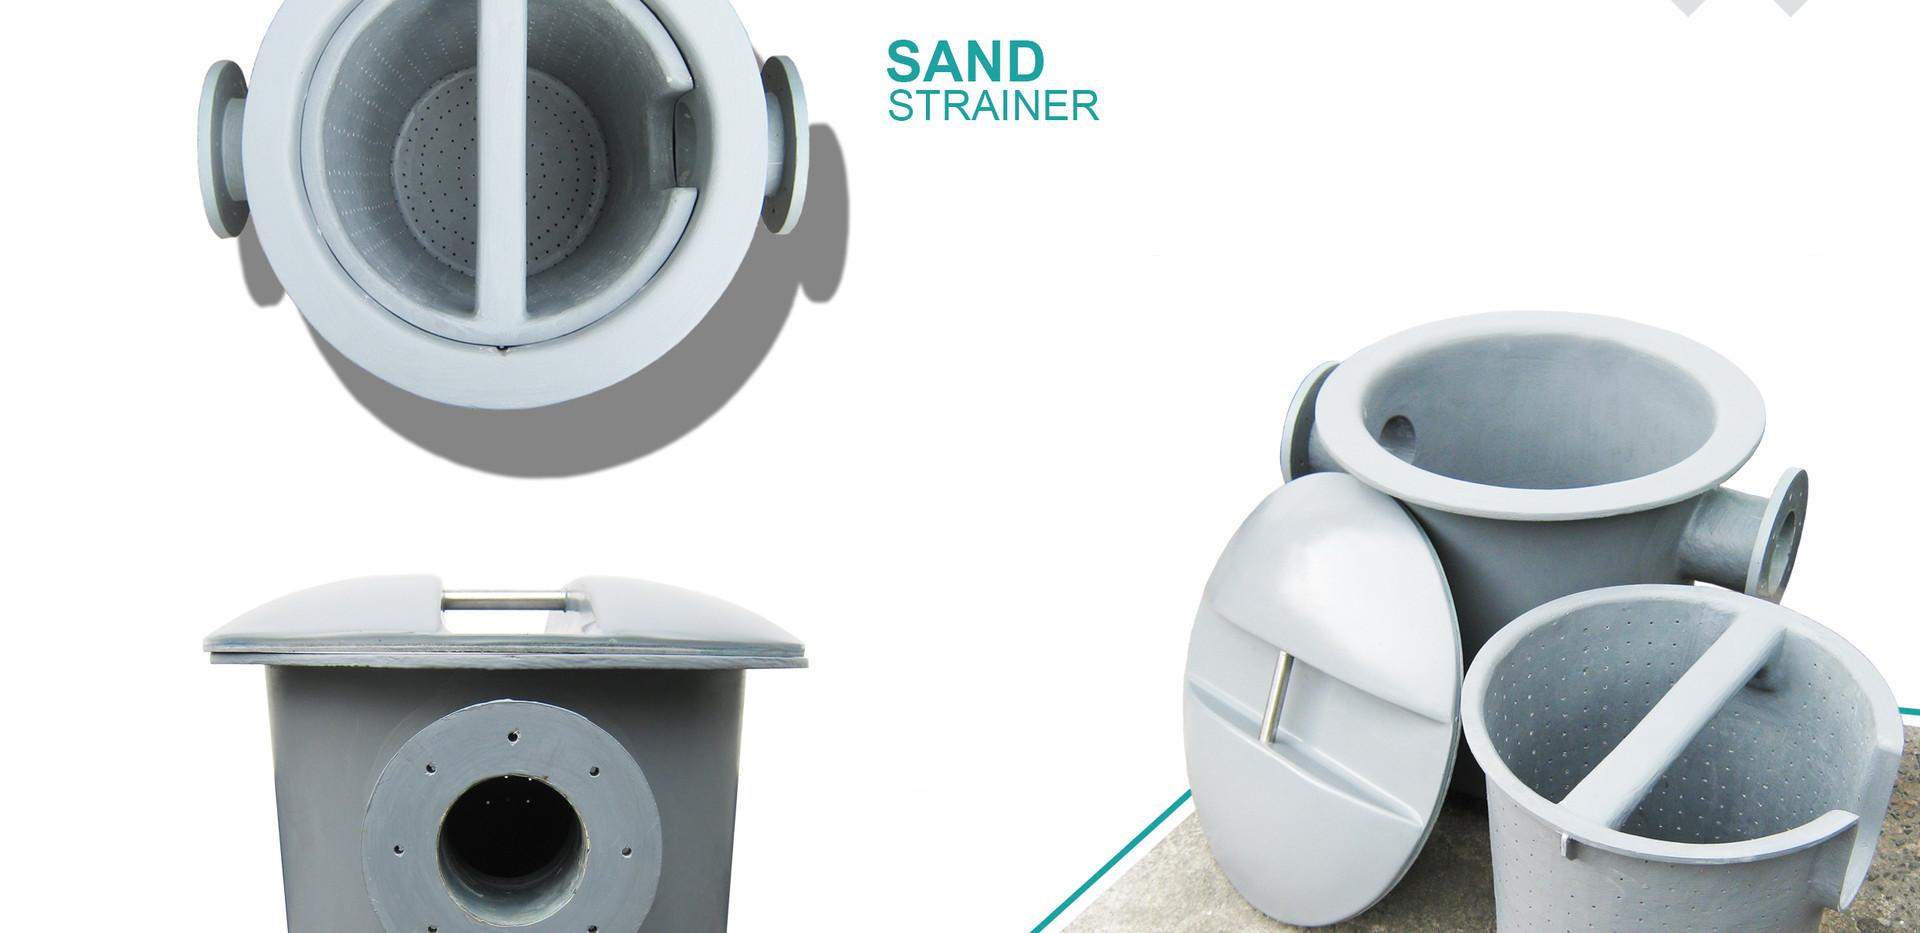 Sand Strainer